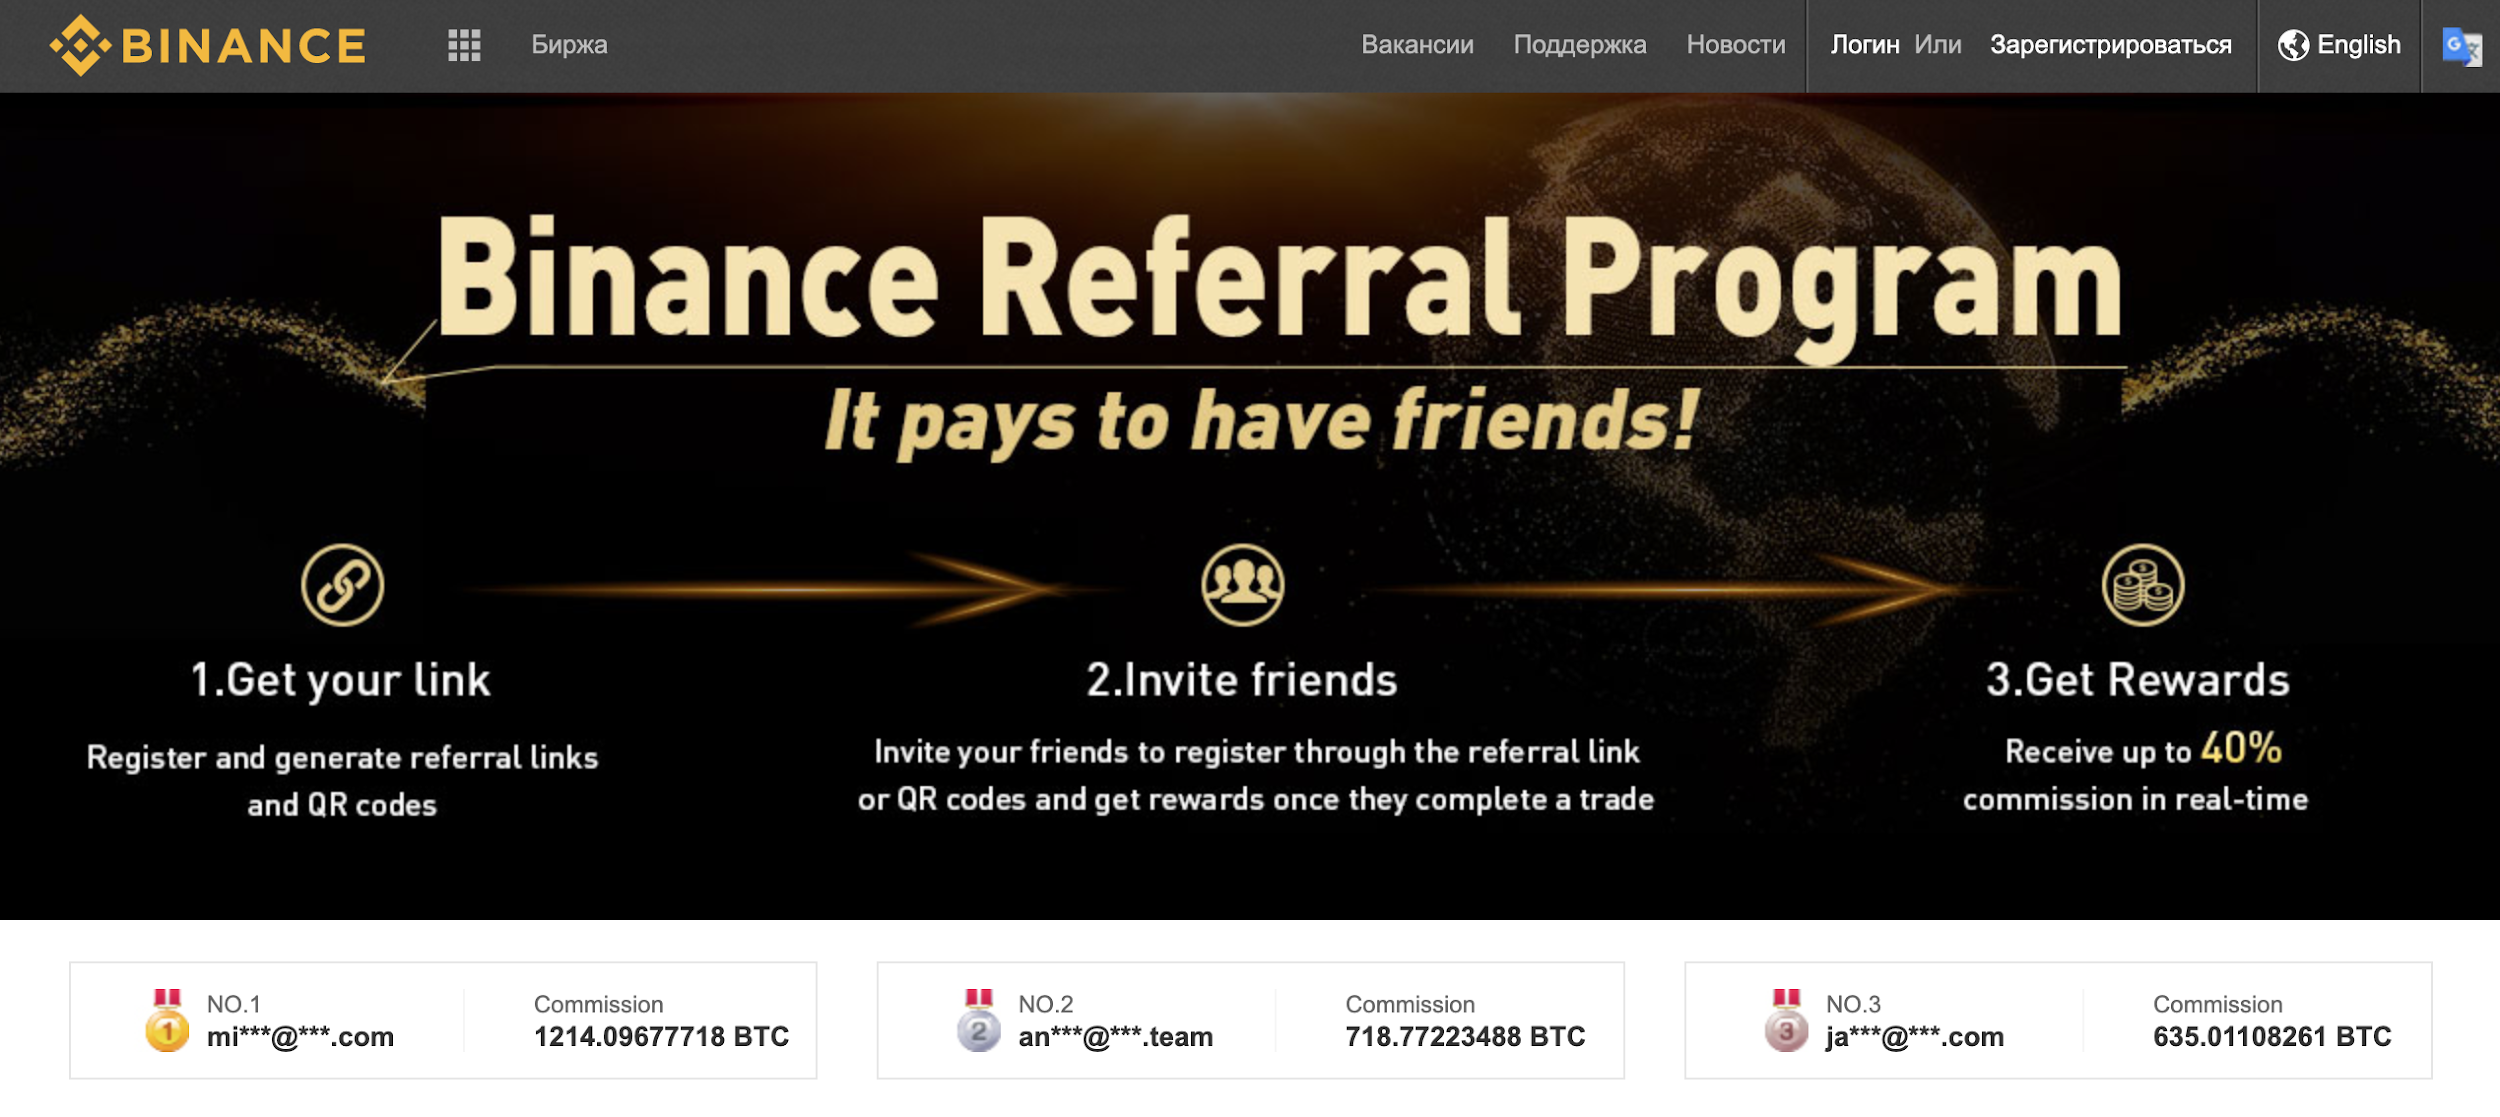 Binance Referral Program